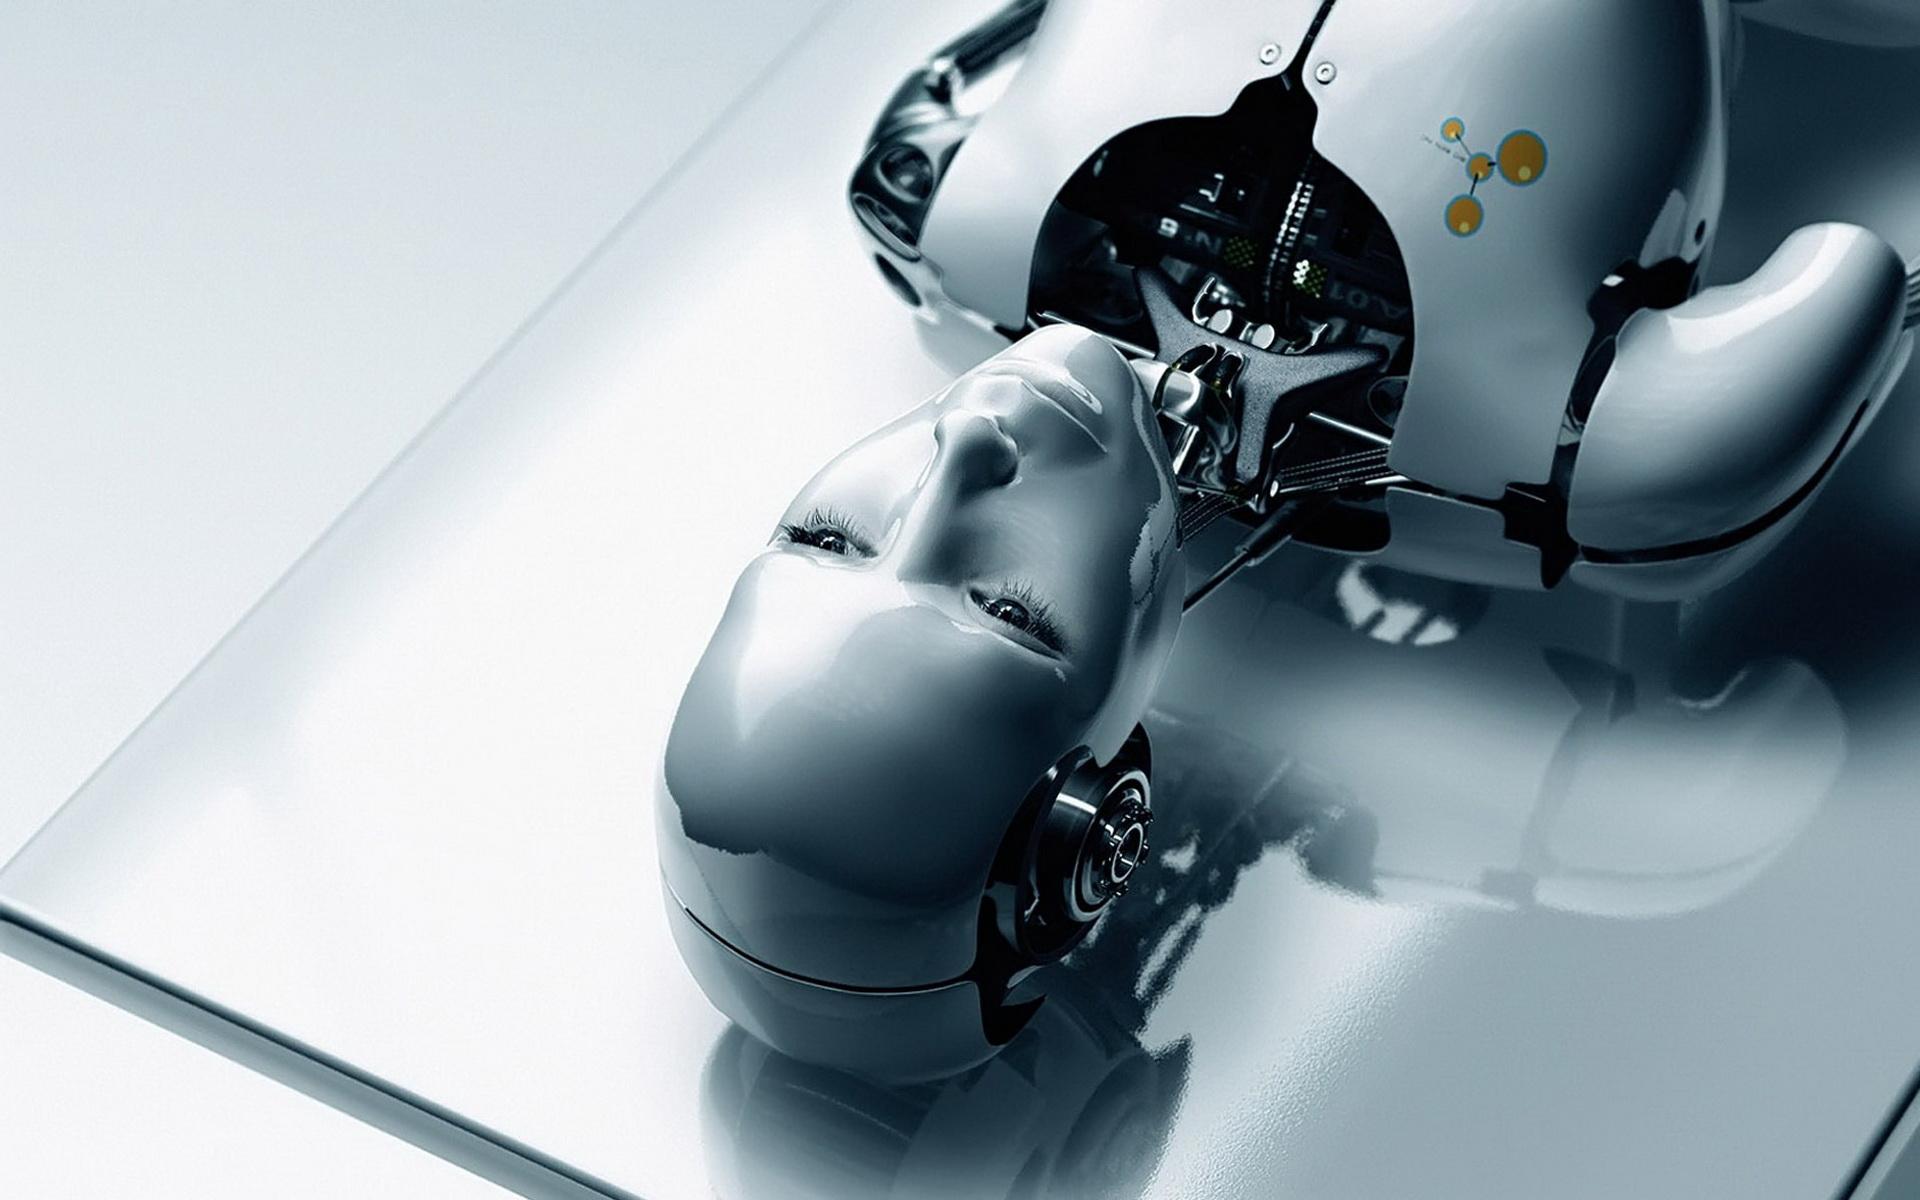 Humanoid Robot Wallpapers HD Wallpapers 1920x1200